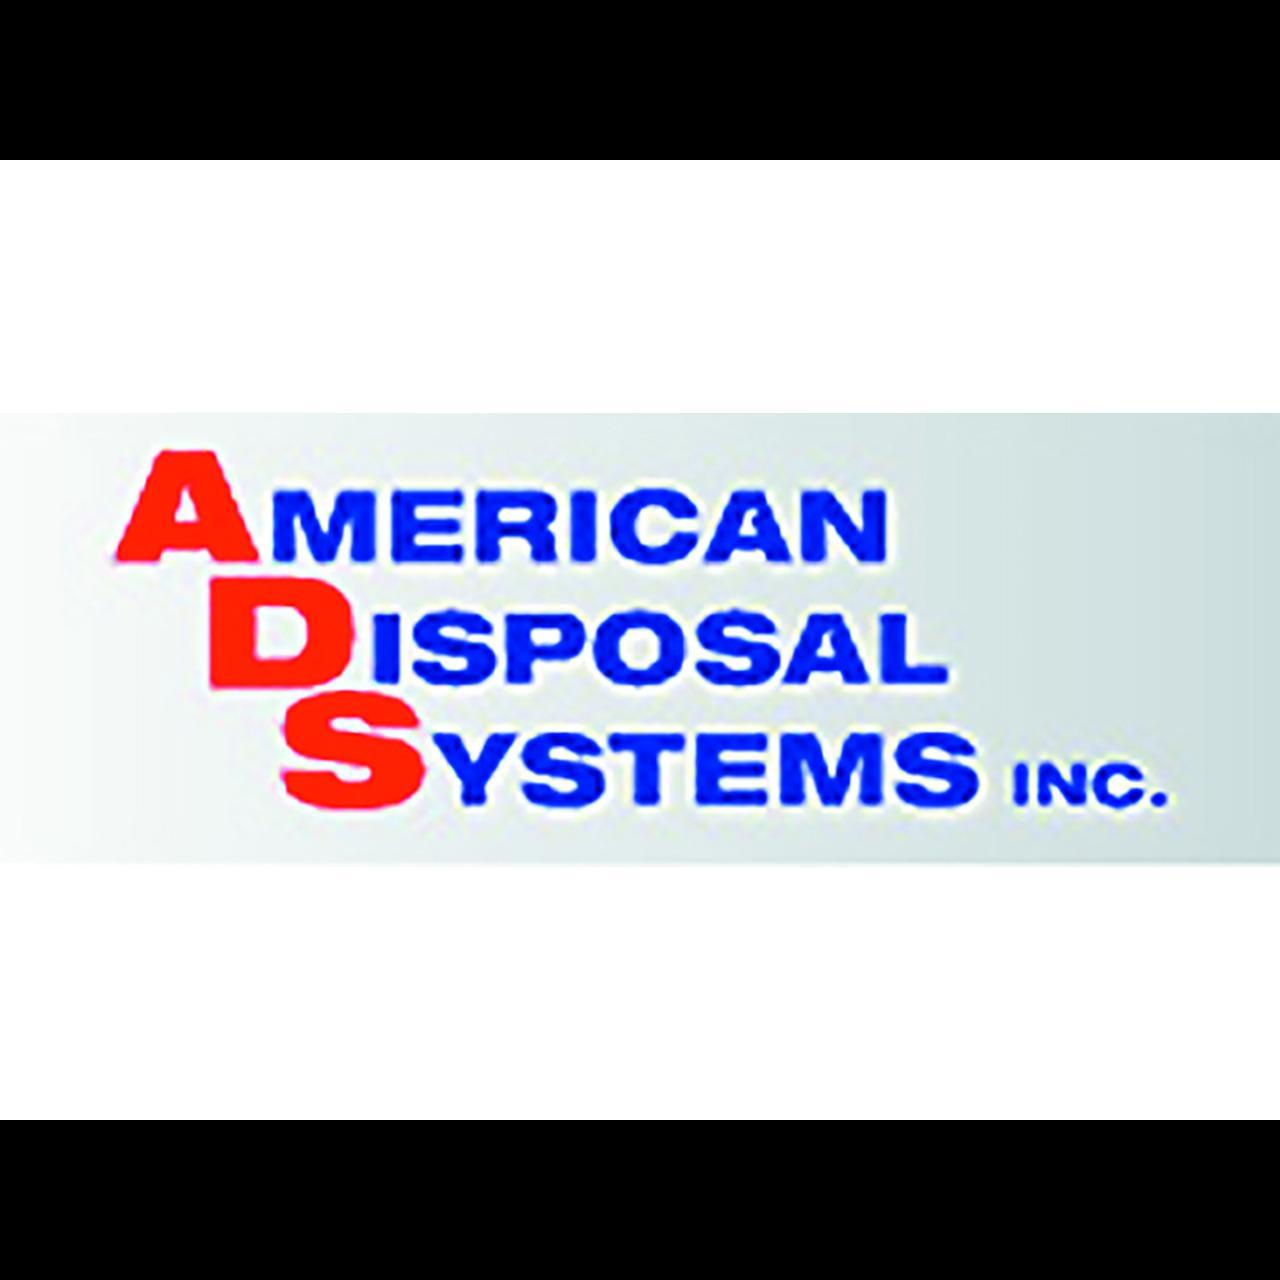 American Disposal Systems - Philadelphia, PA - Debris & Waste Removal